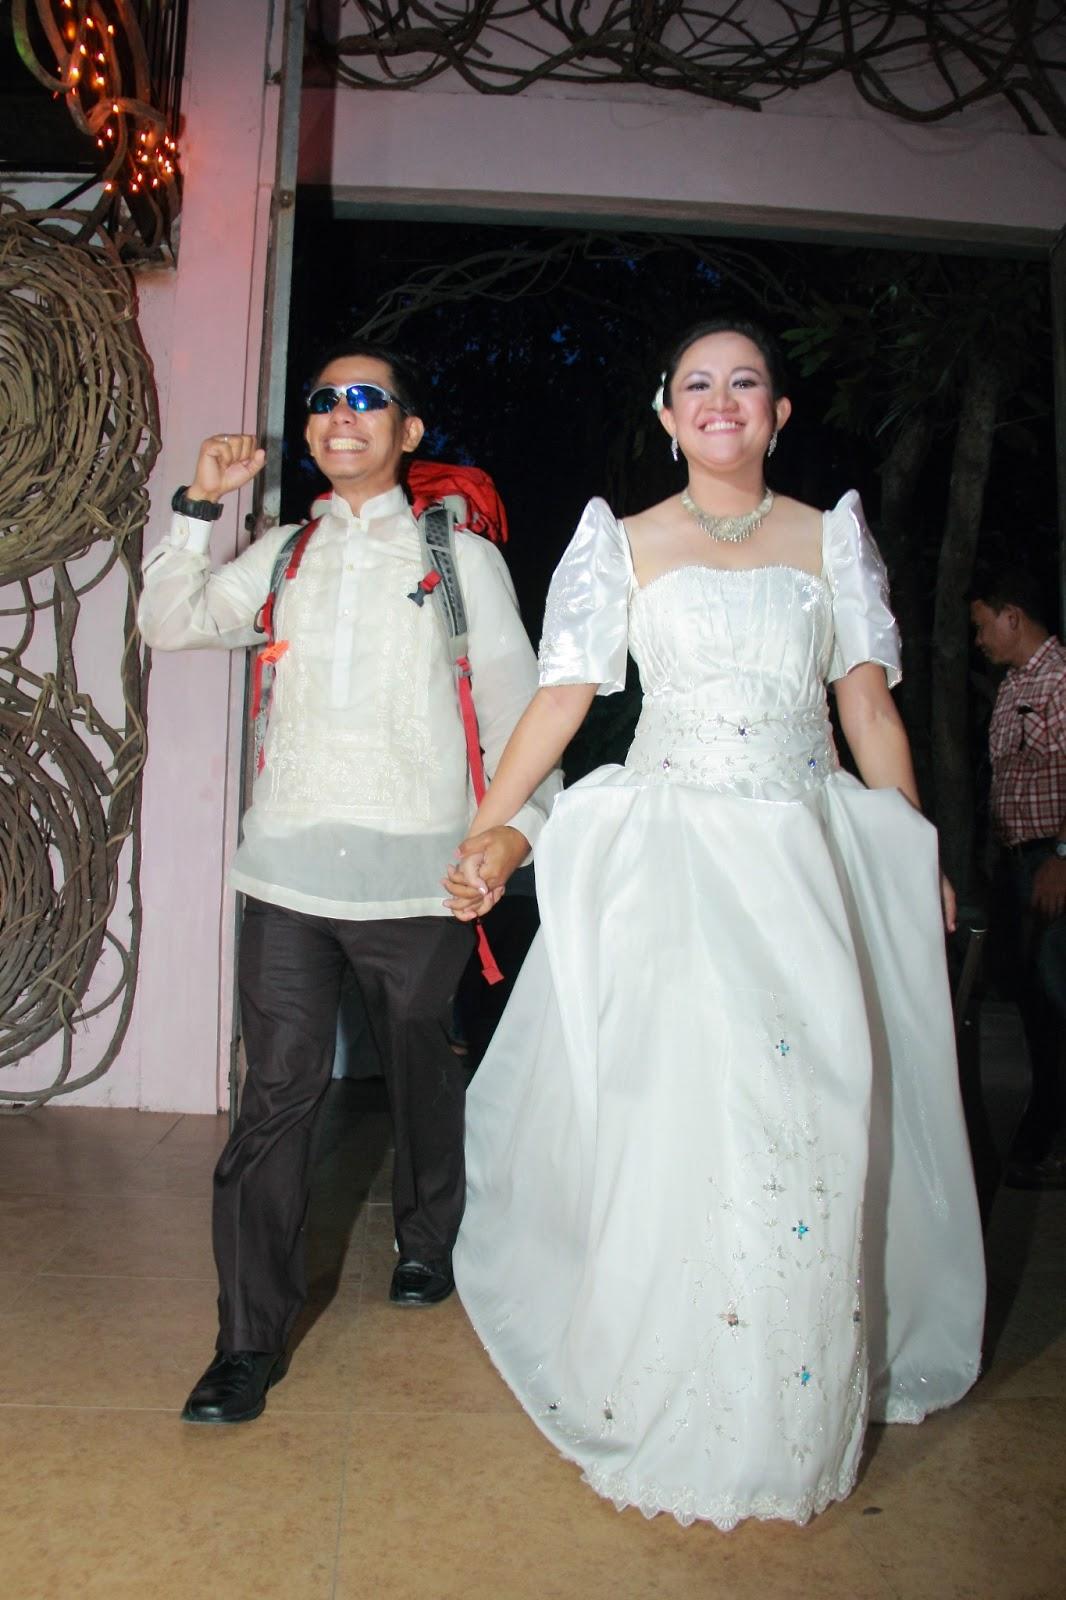 Fancy Mafia Wedding Theme Gallery - Wedding Dress Inspiration ...